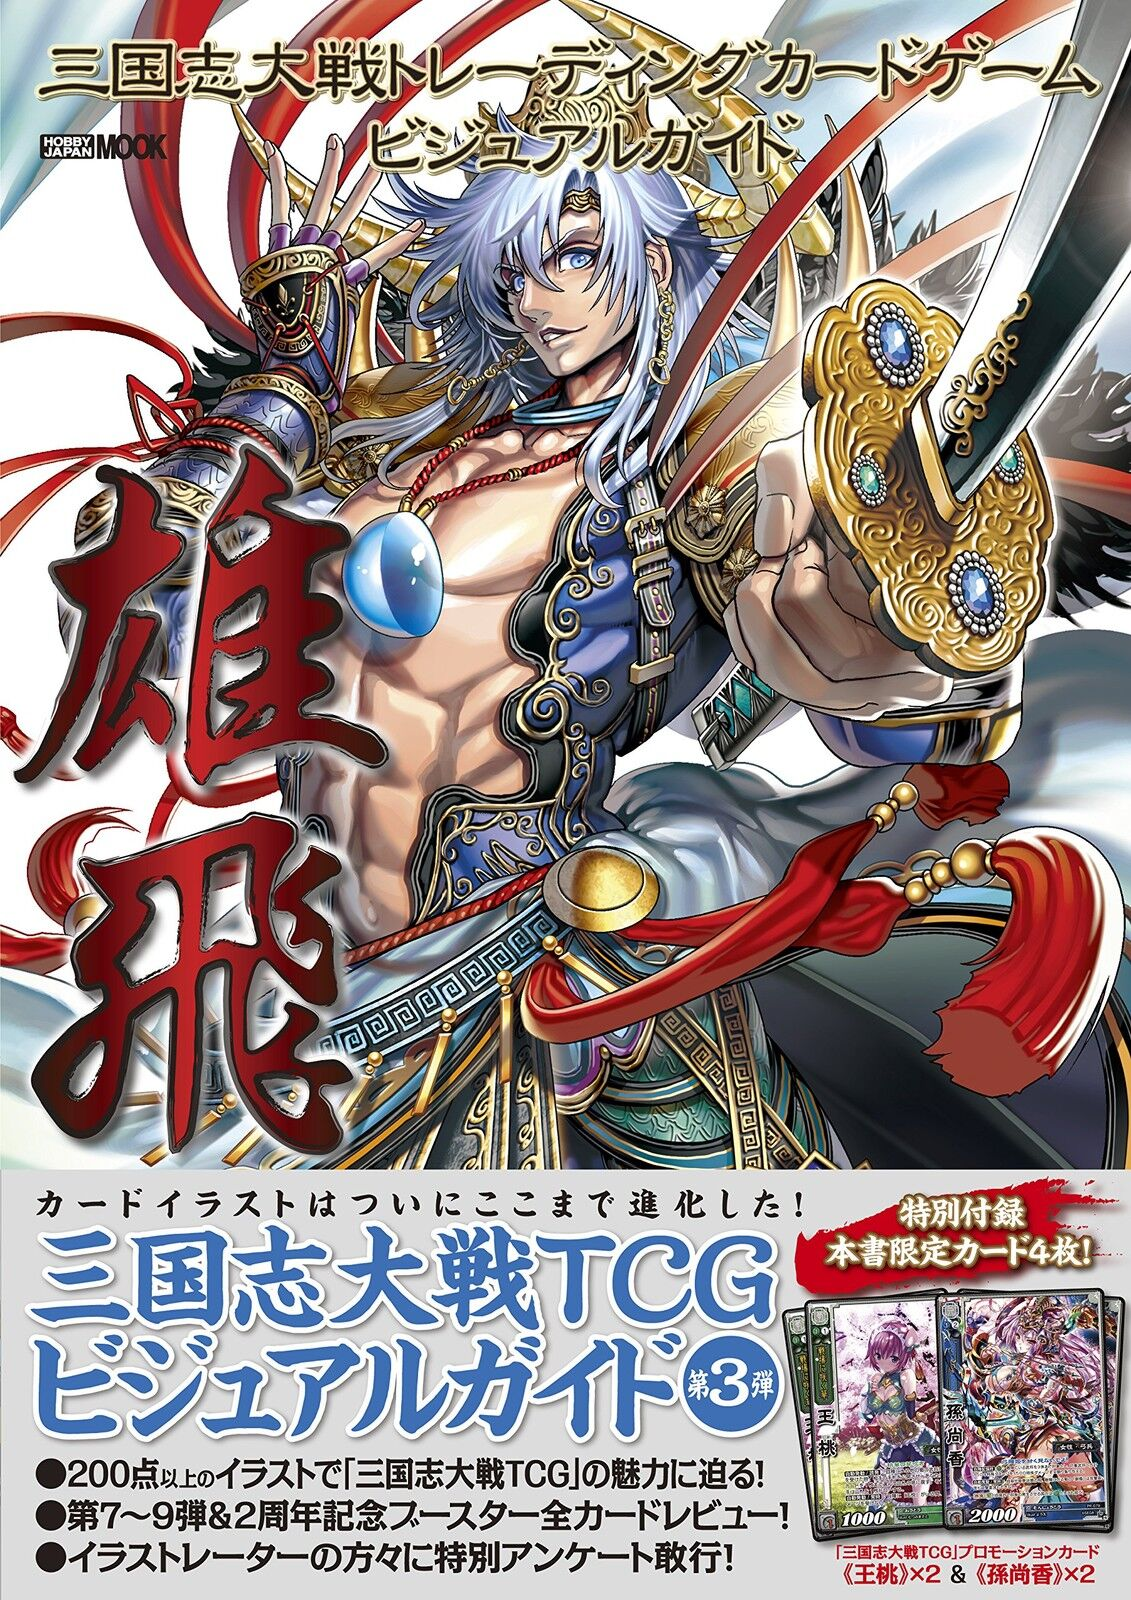 Sangokushi Taisen Trading Card Game Yuuhi Visuelle Führer Yuuhi Game Tcg Buch W   Karten 85eedf